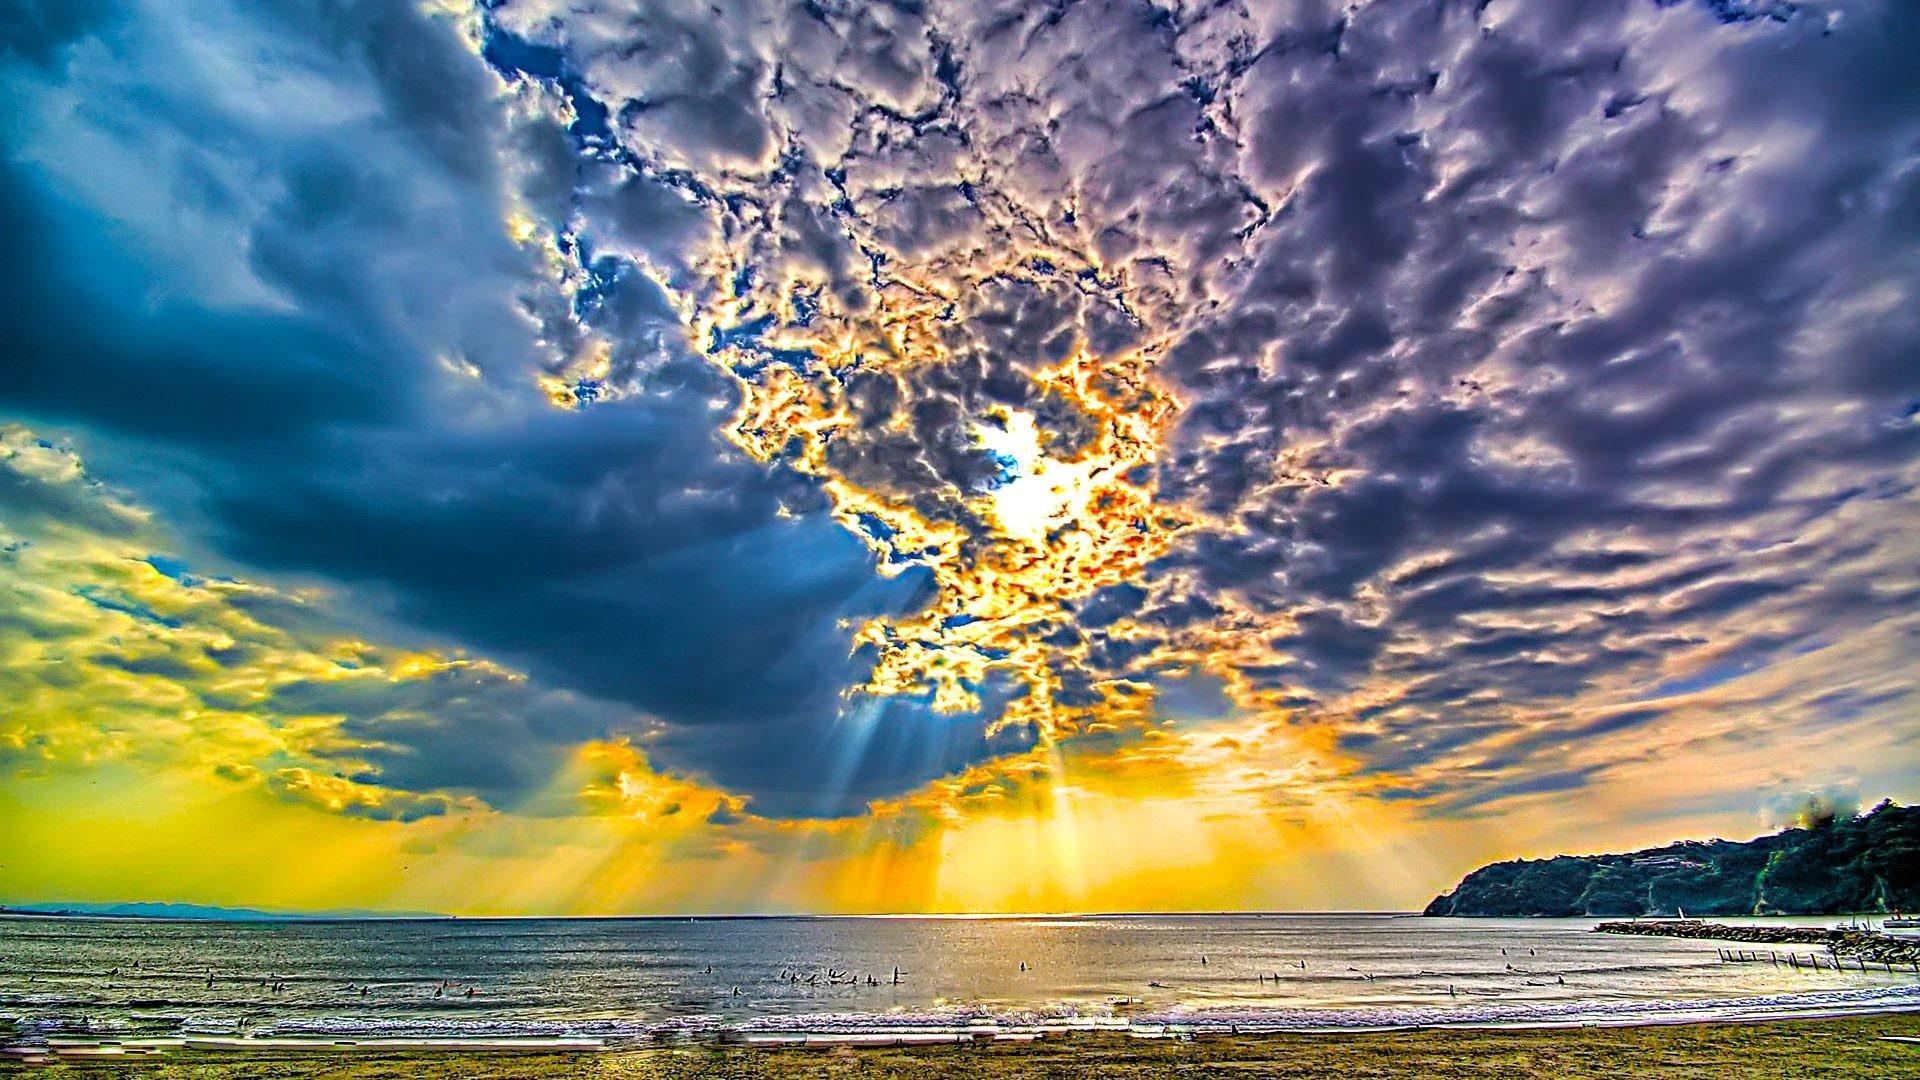 Sky Day Ray Sea Sun Holiday Sunny Beach Desktop Wallpaper Nature Detail